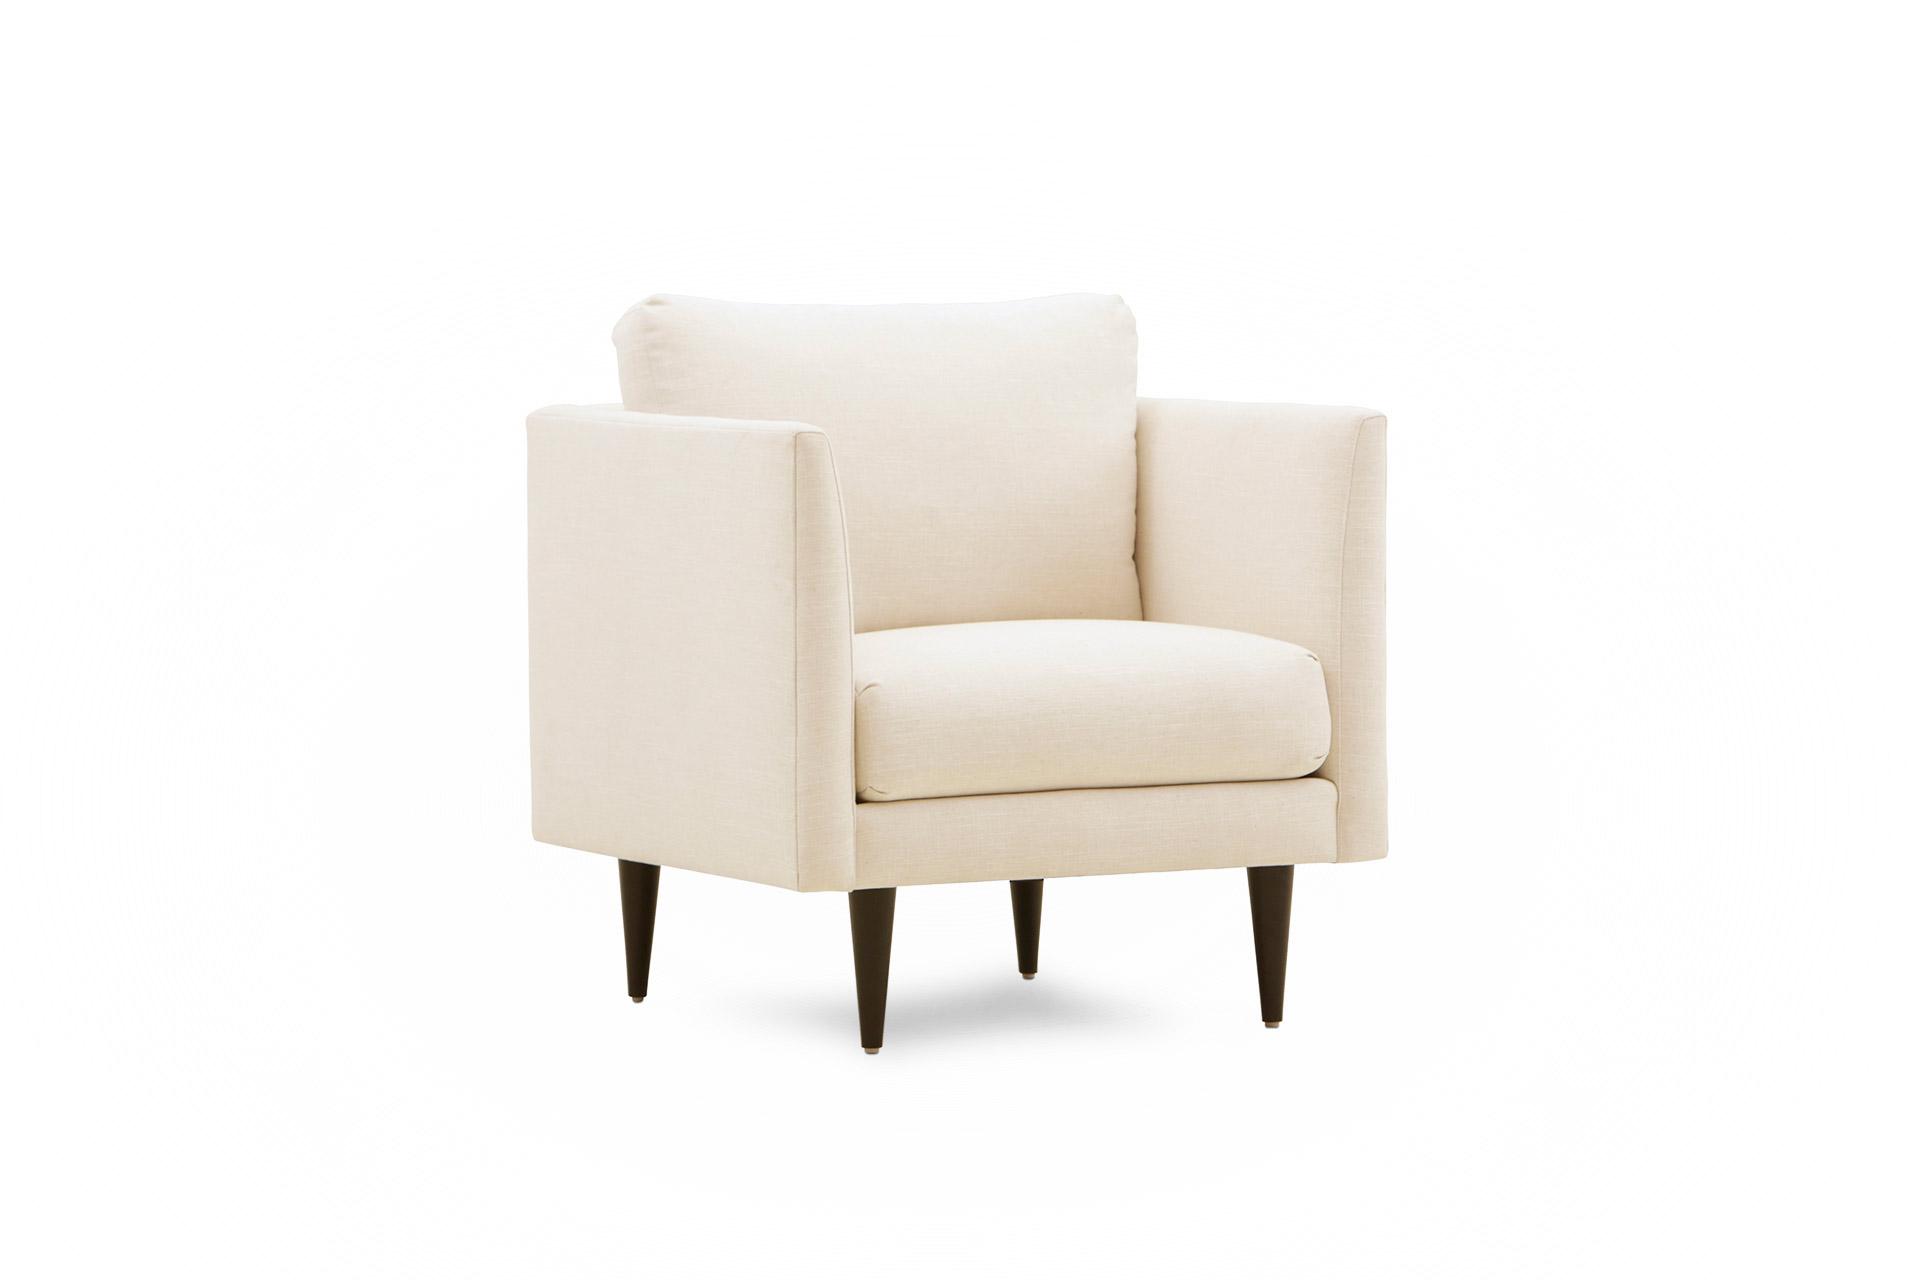 loft-and-manor-alki-chair-3